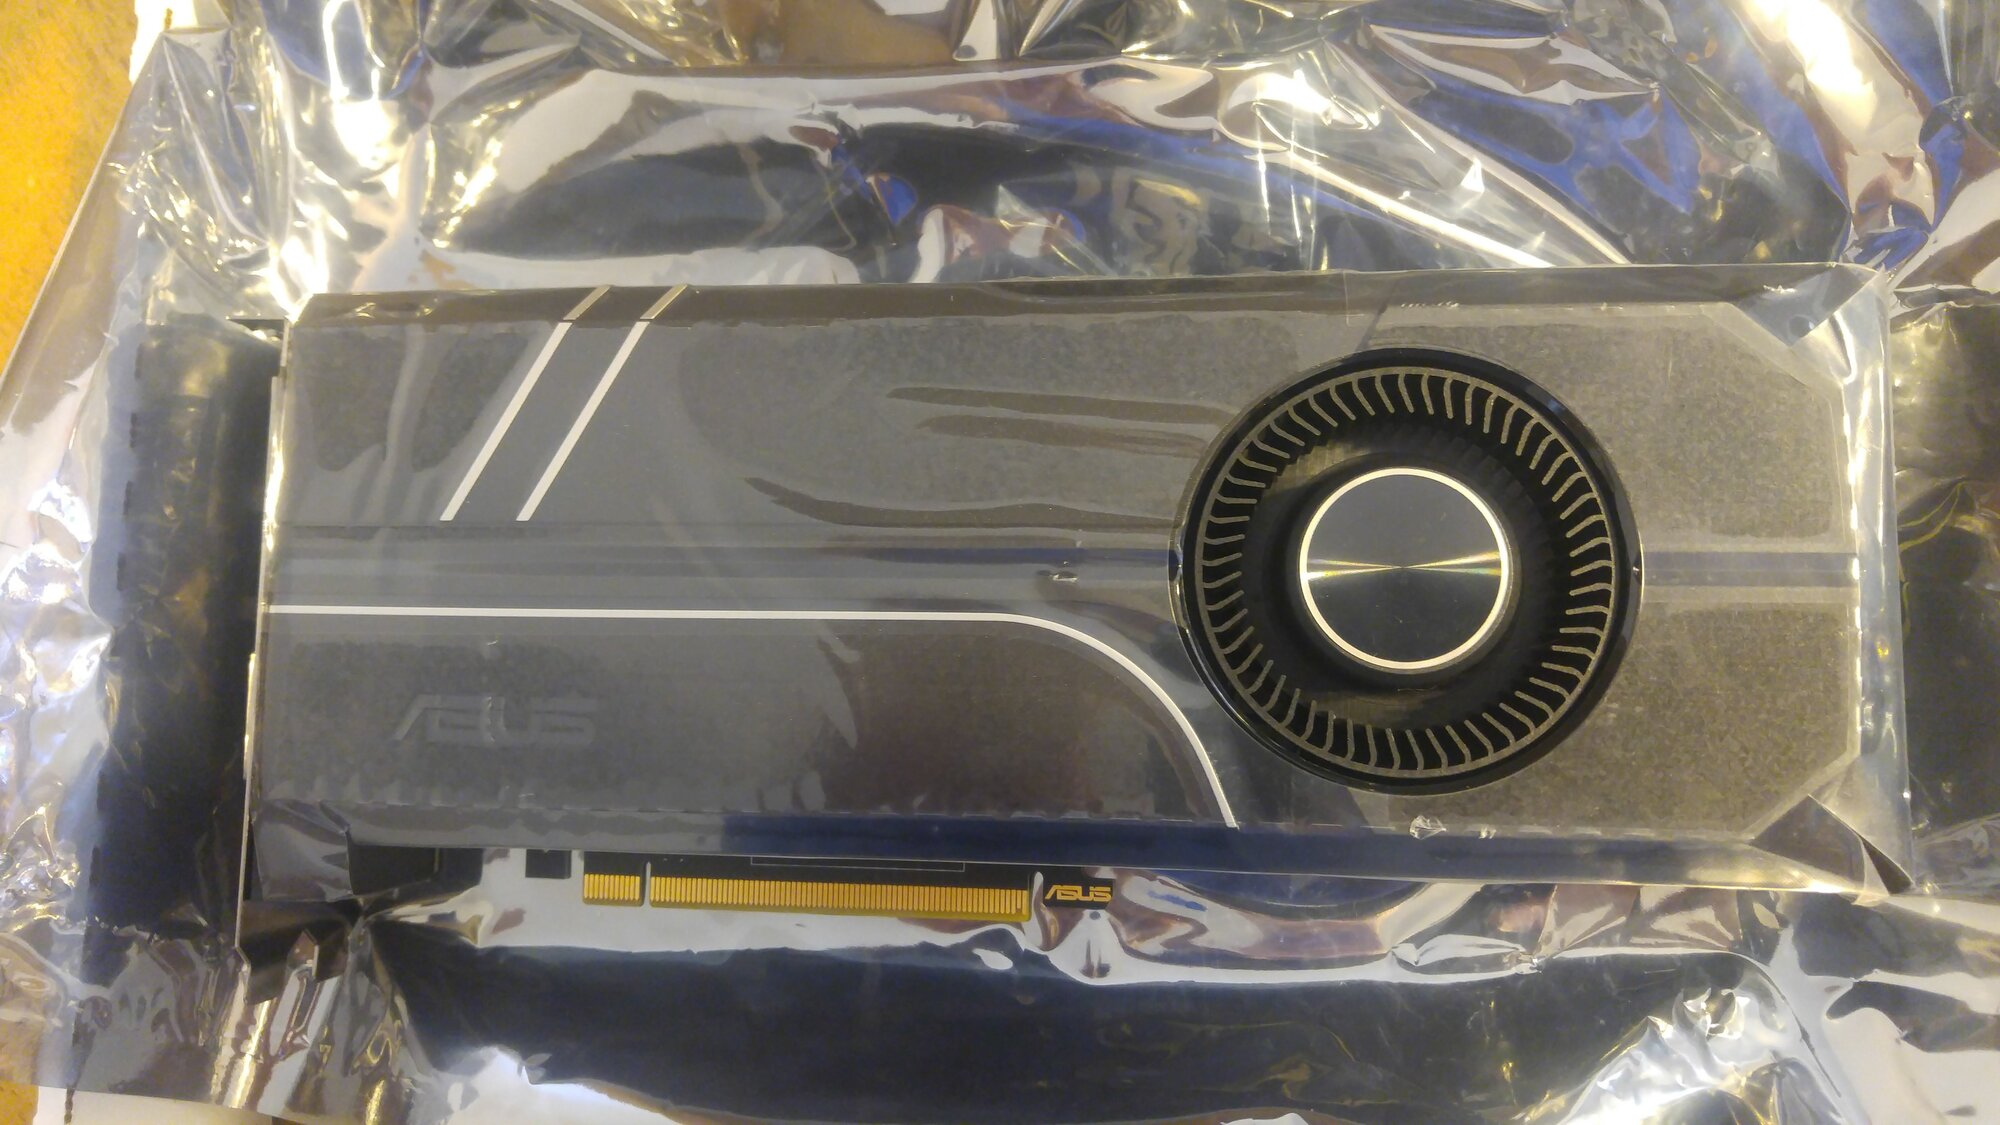 For Sale RMA new Asus GTX 1060 6GB blower style GPU / USED R9 390x